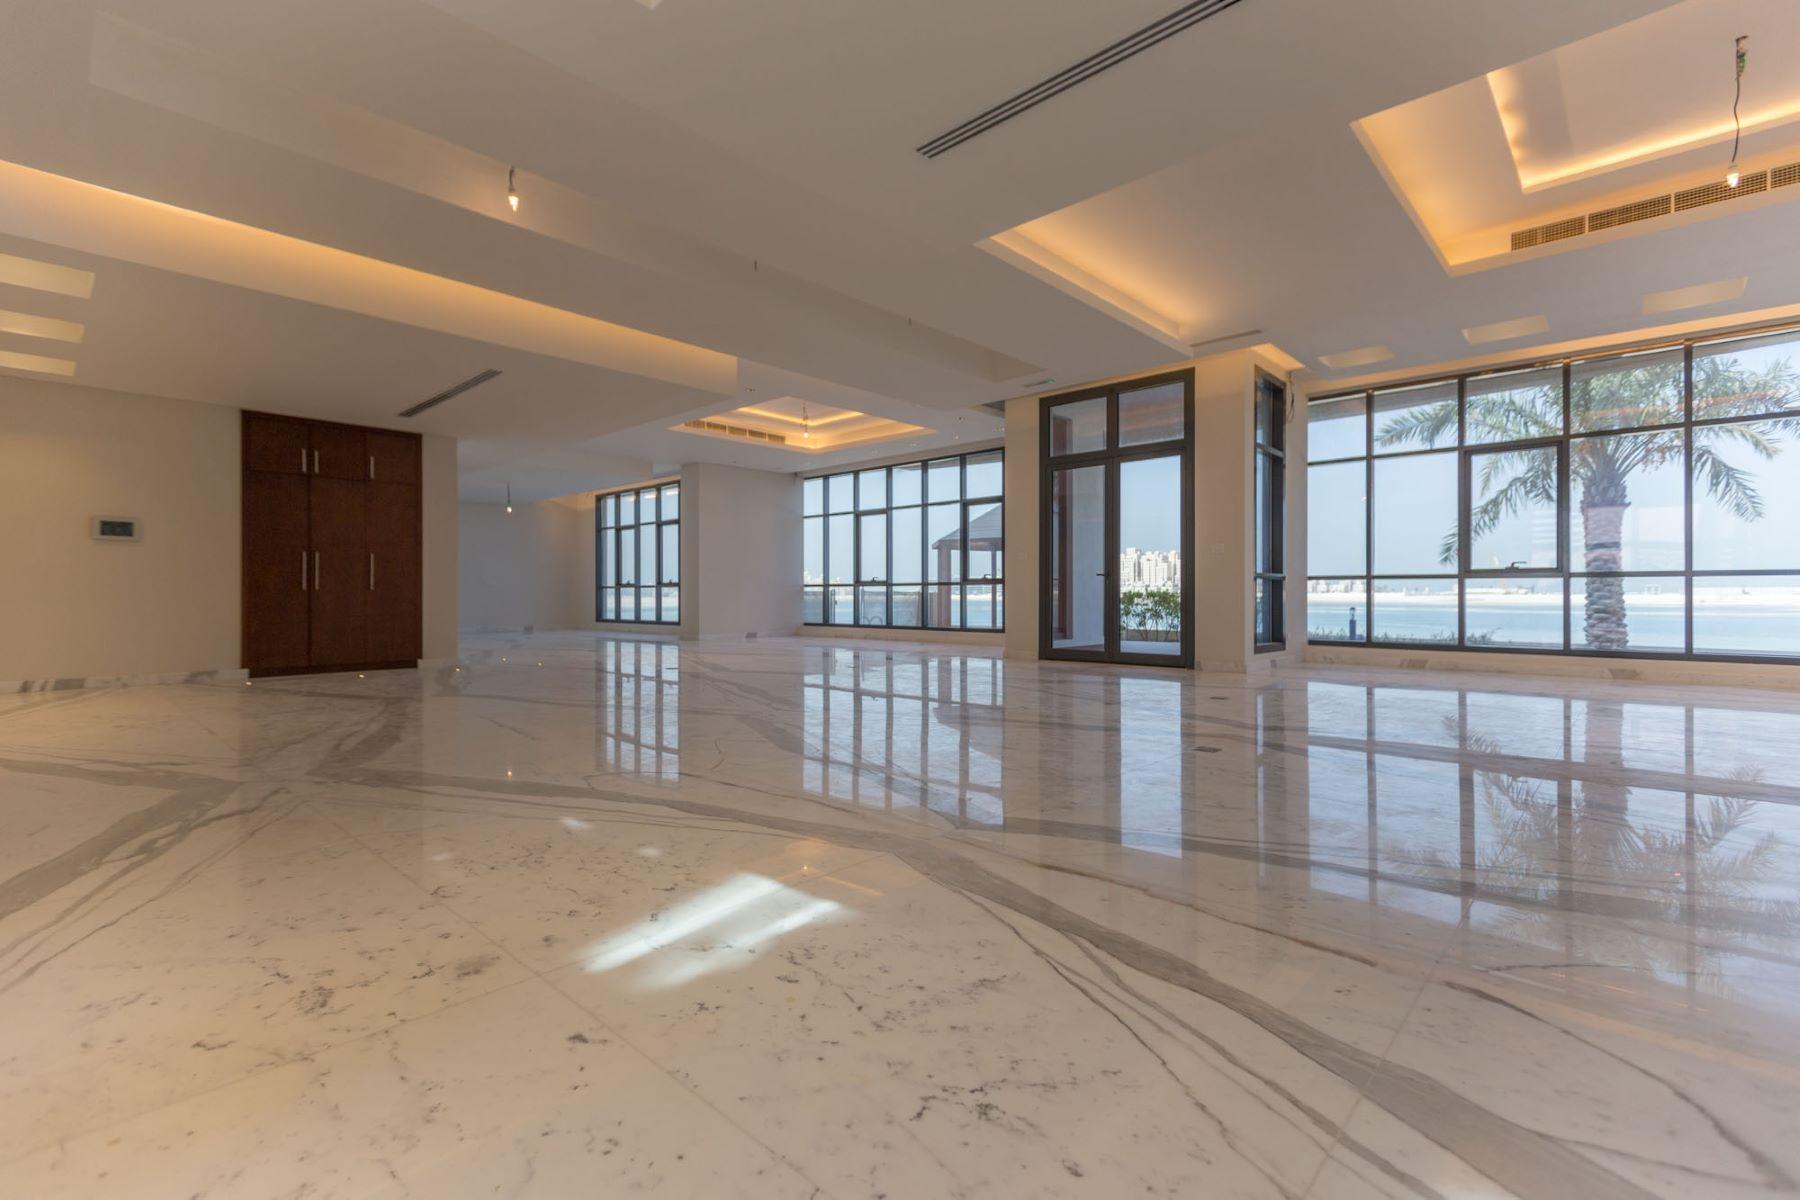 Additional photo for property listing at 4 Villa Compound Bulk Brand New Palm Jumeirah Dubai, Dubai United Arab Emirates